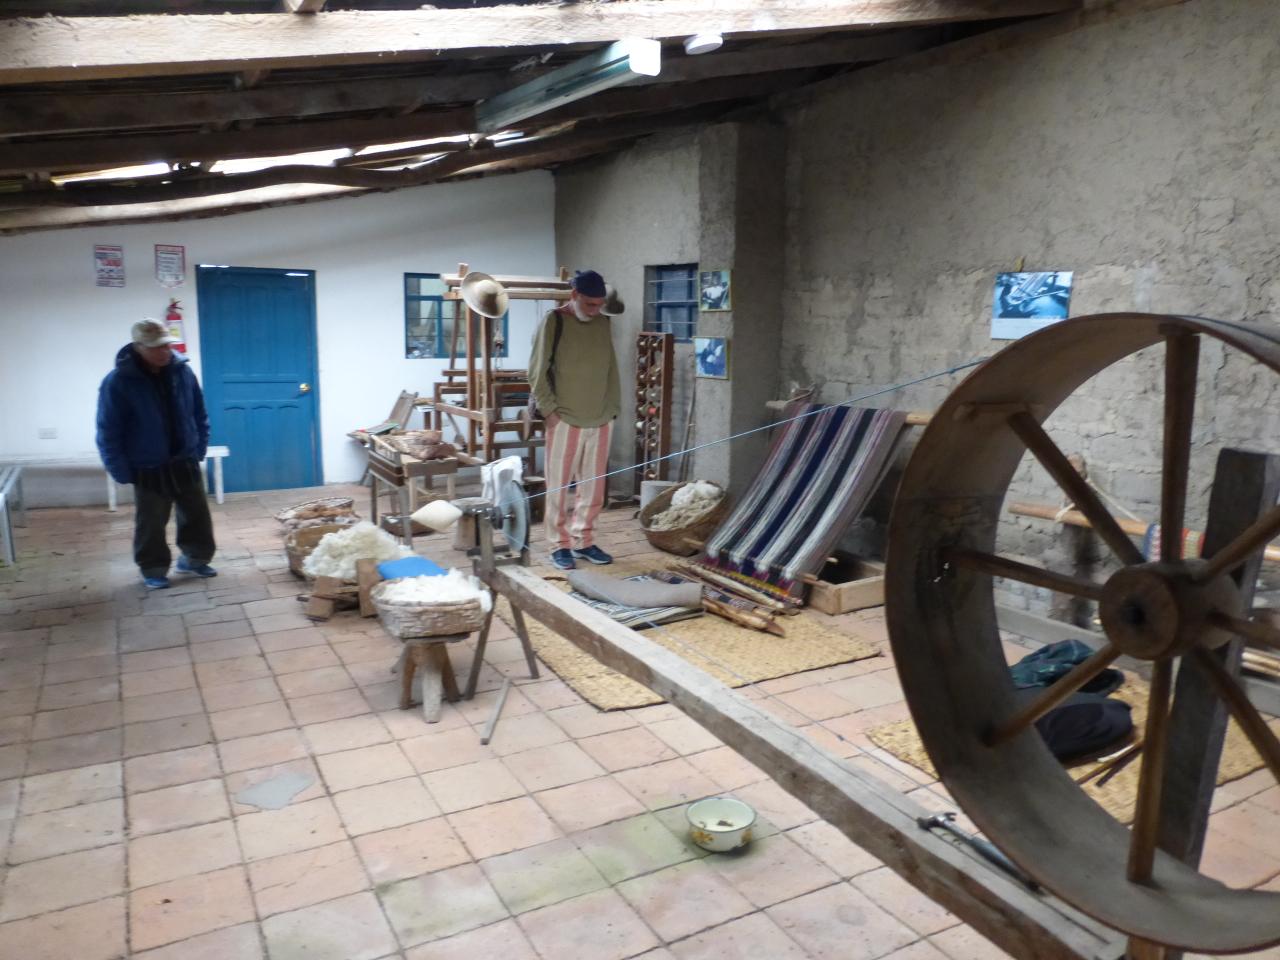 The backstrap loom studio